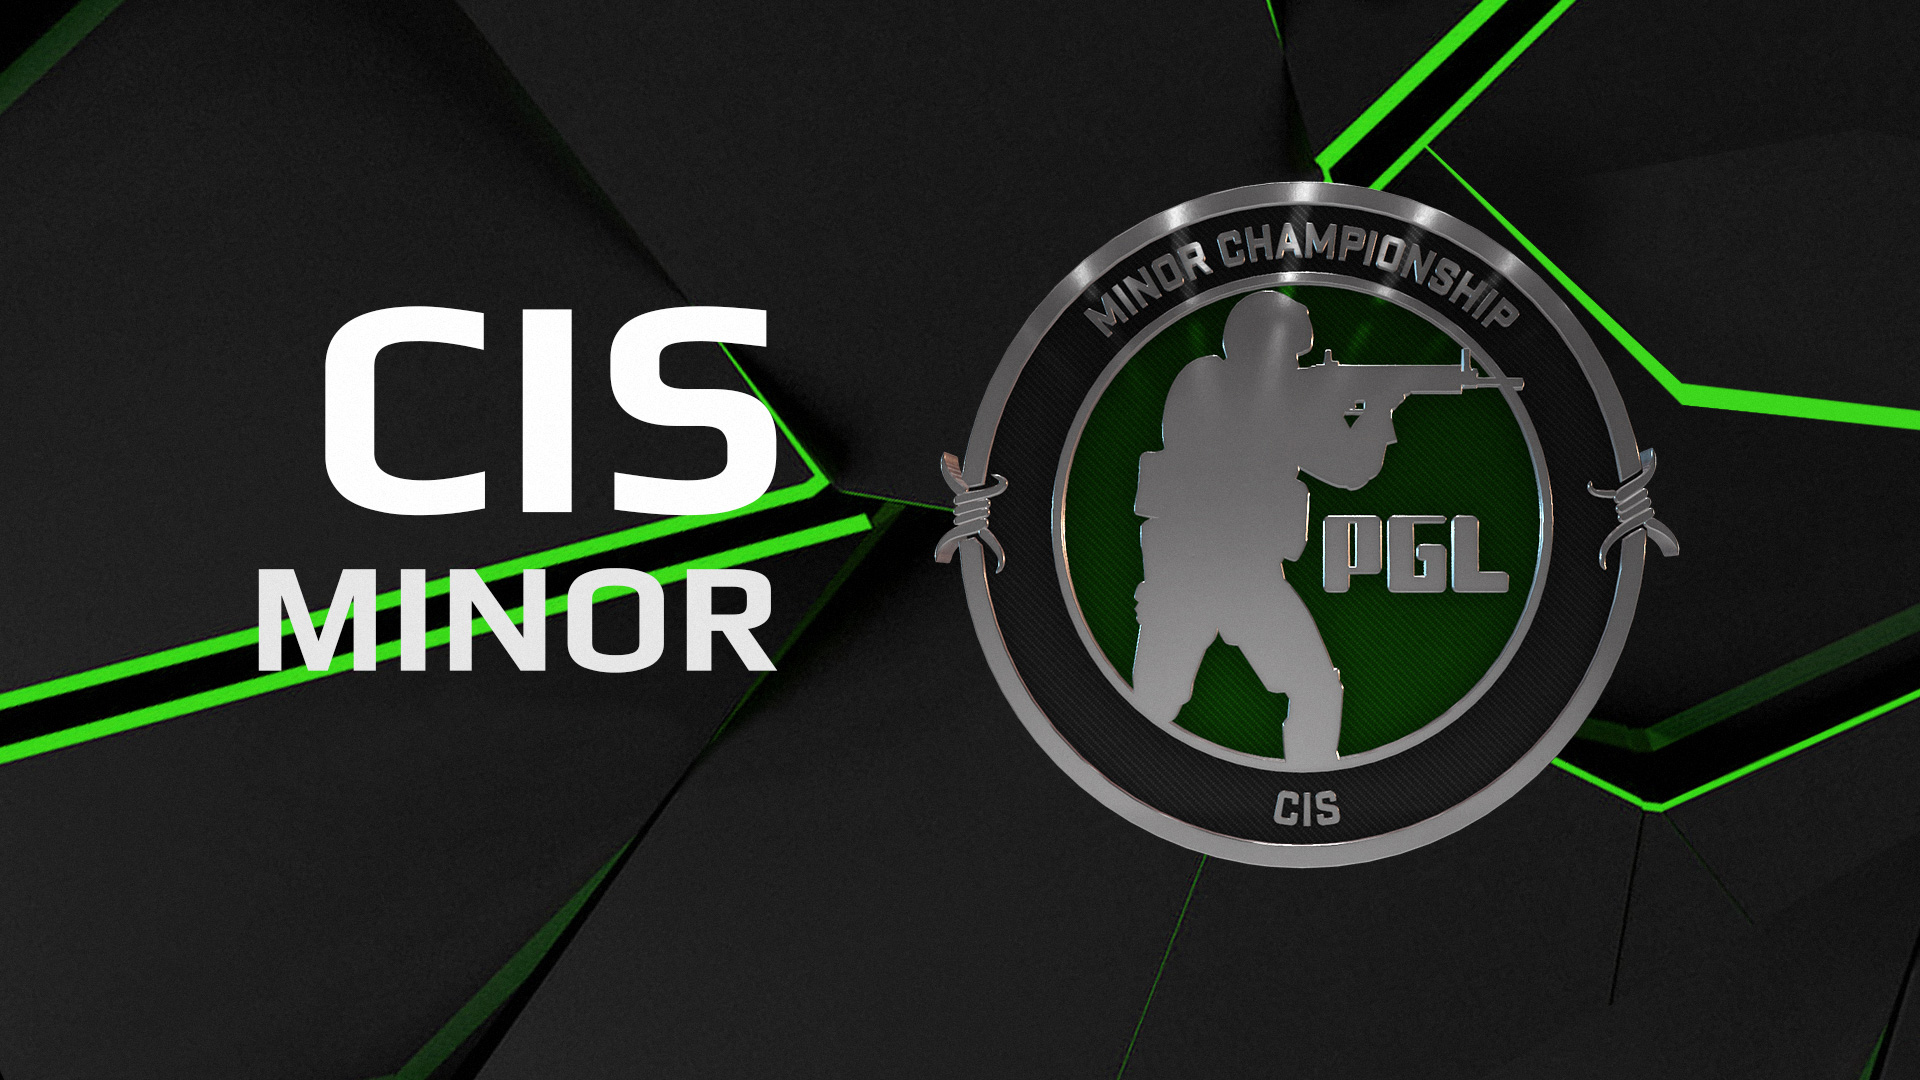 CIS Minor